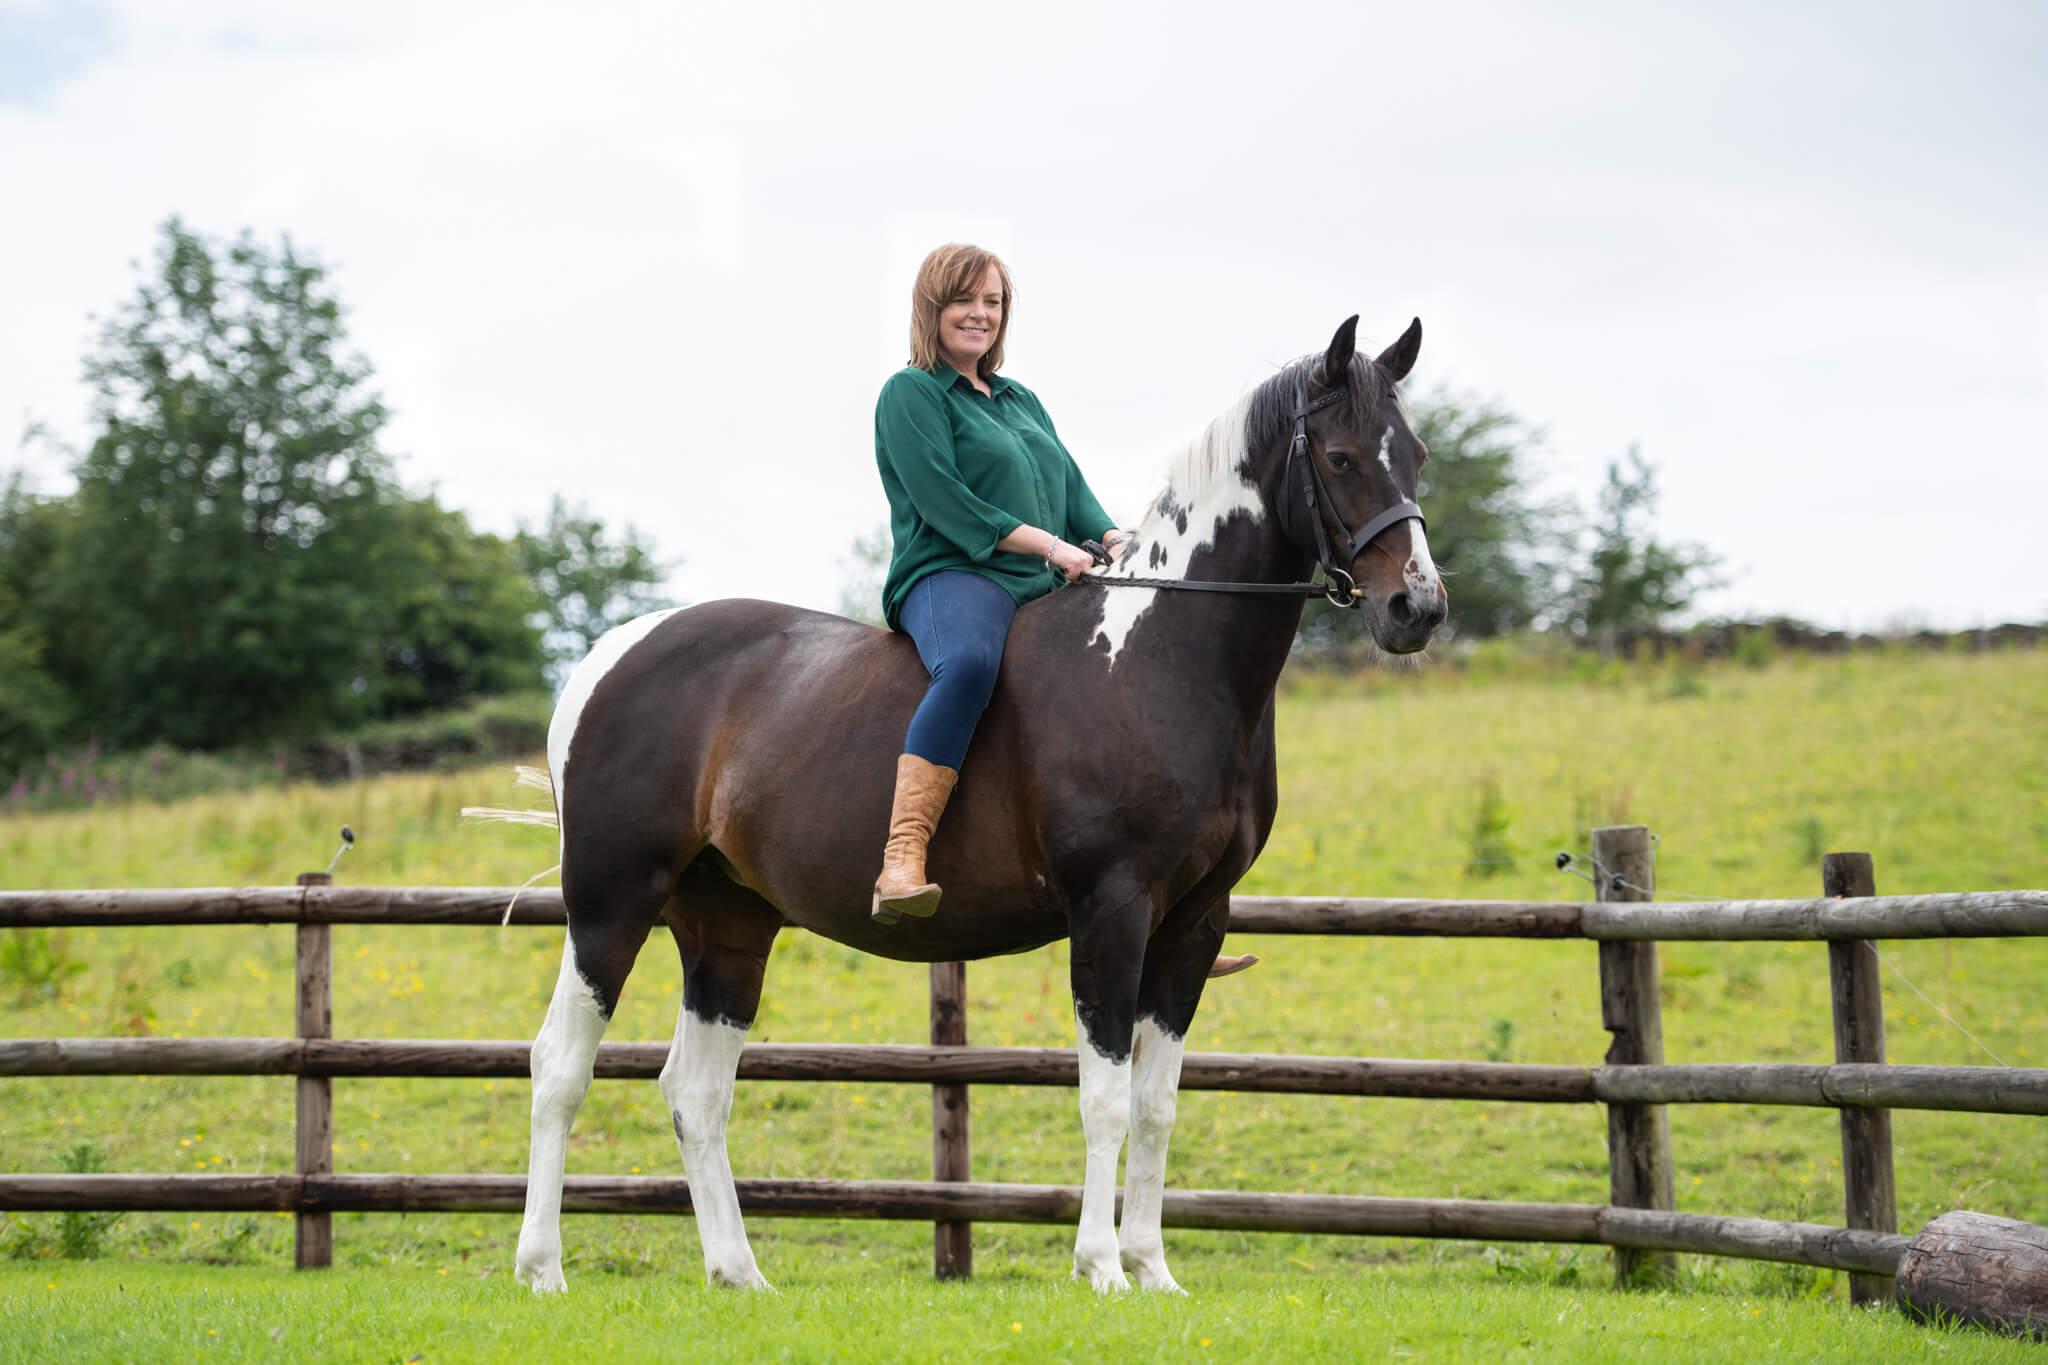 Coloured-Horse-Bareback